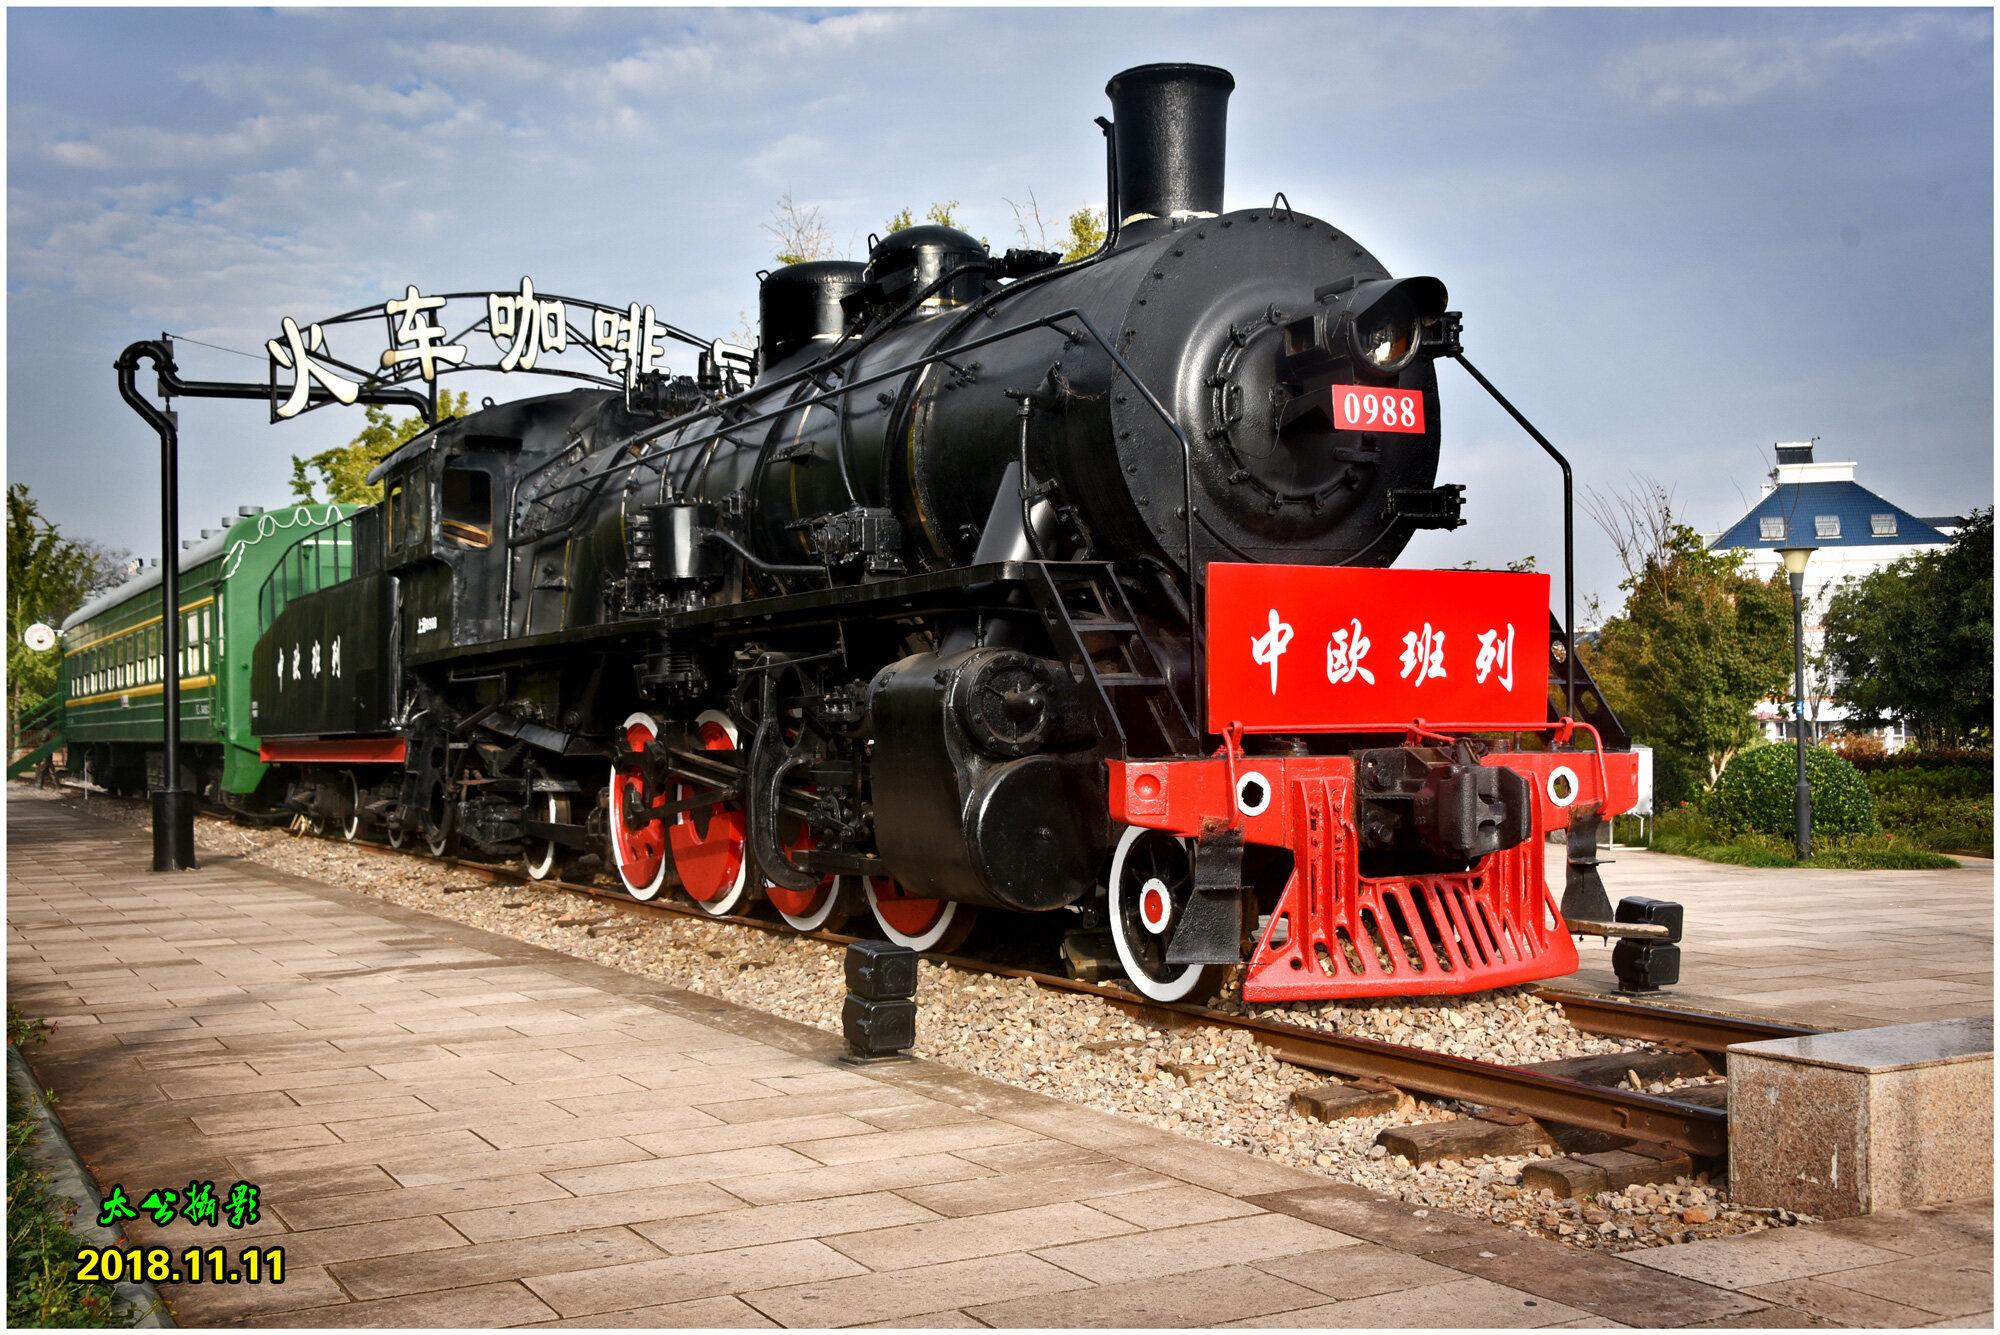 DSC_4226火车头公园2 2.jpg